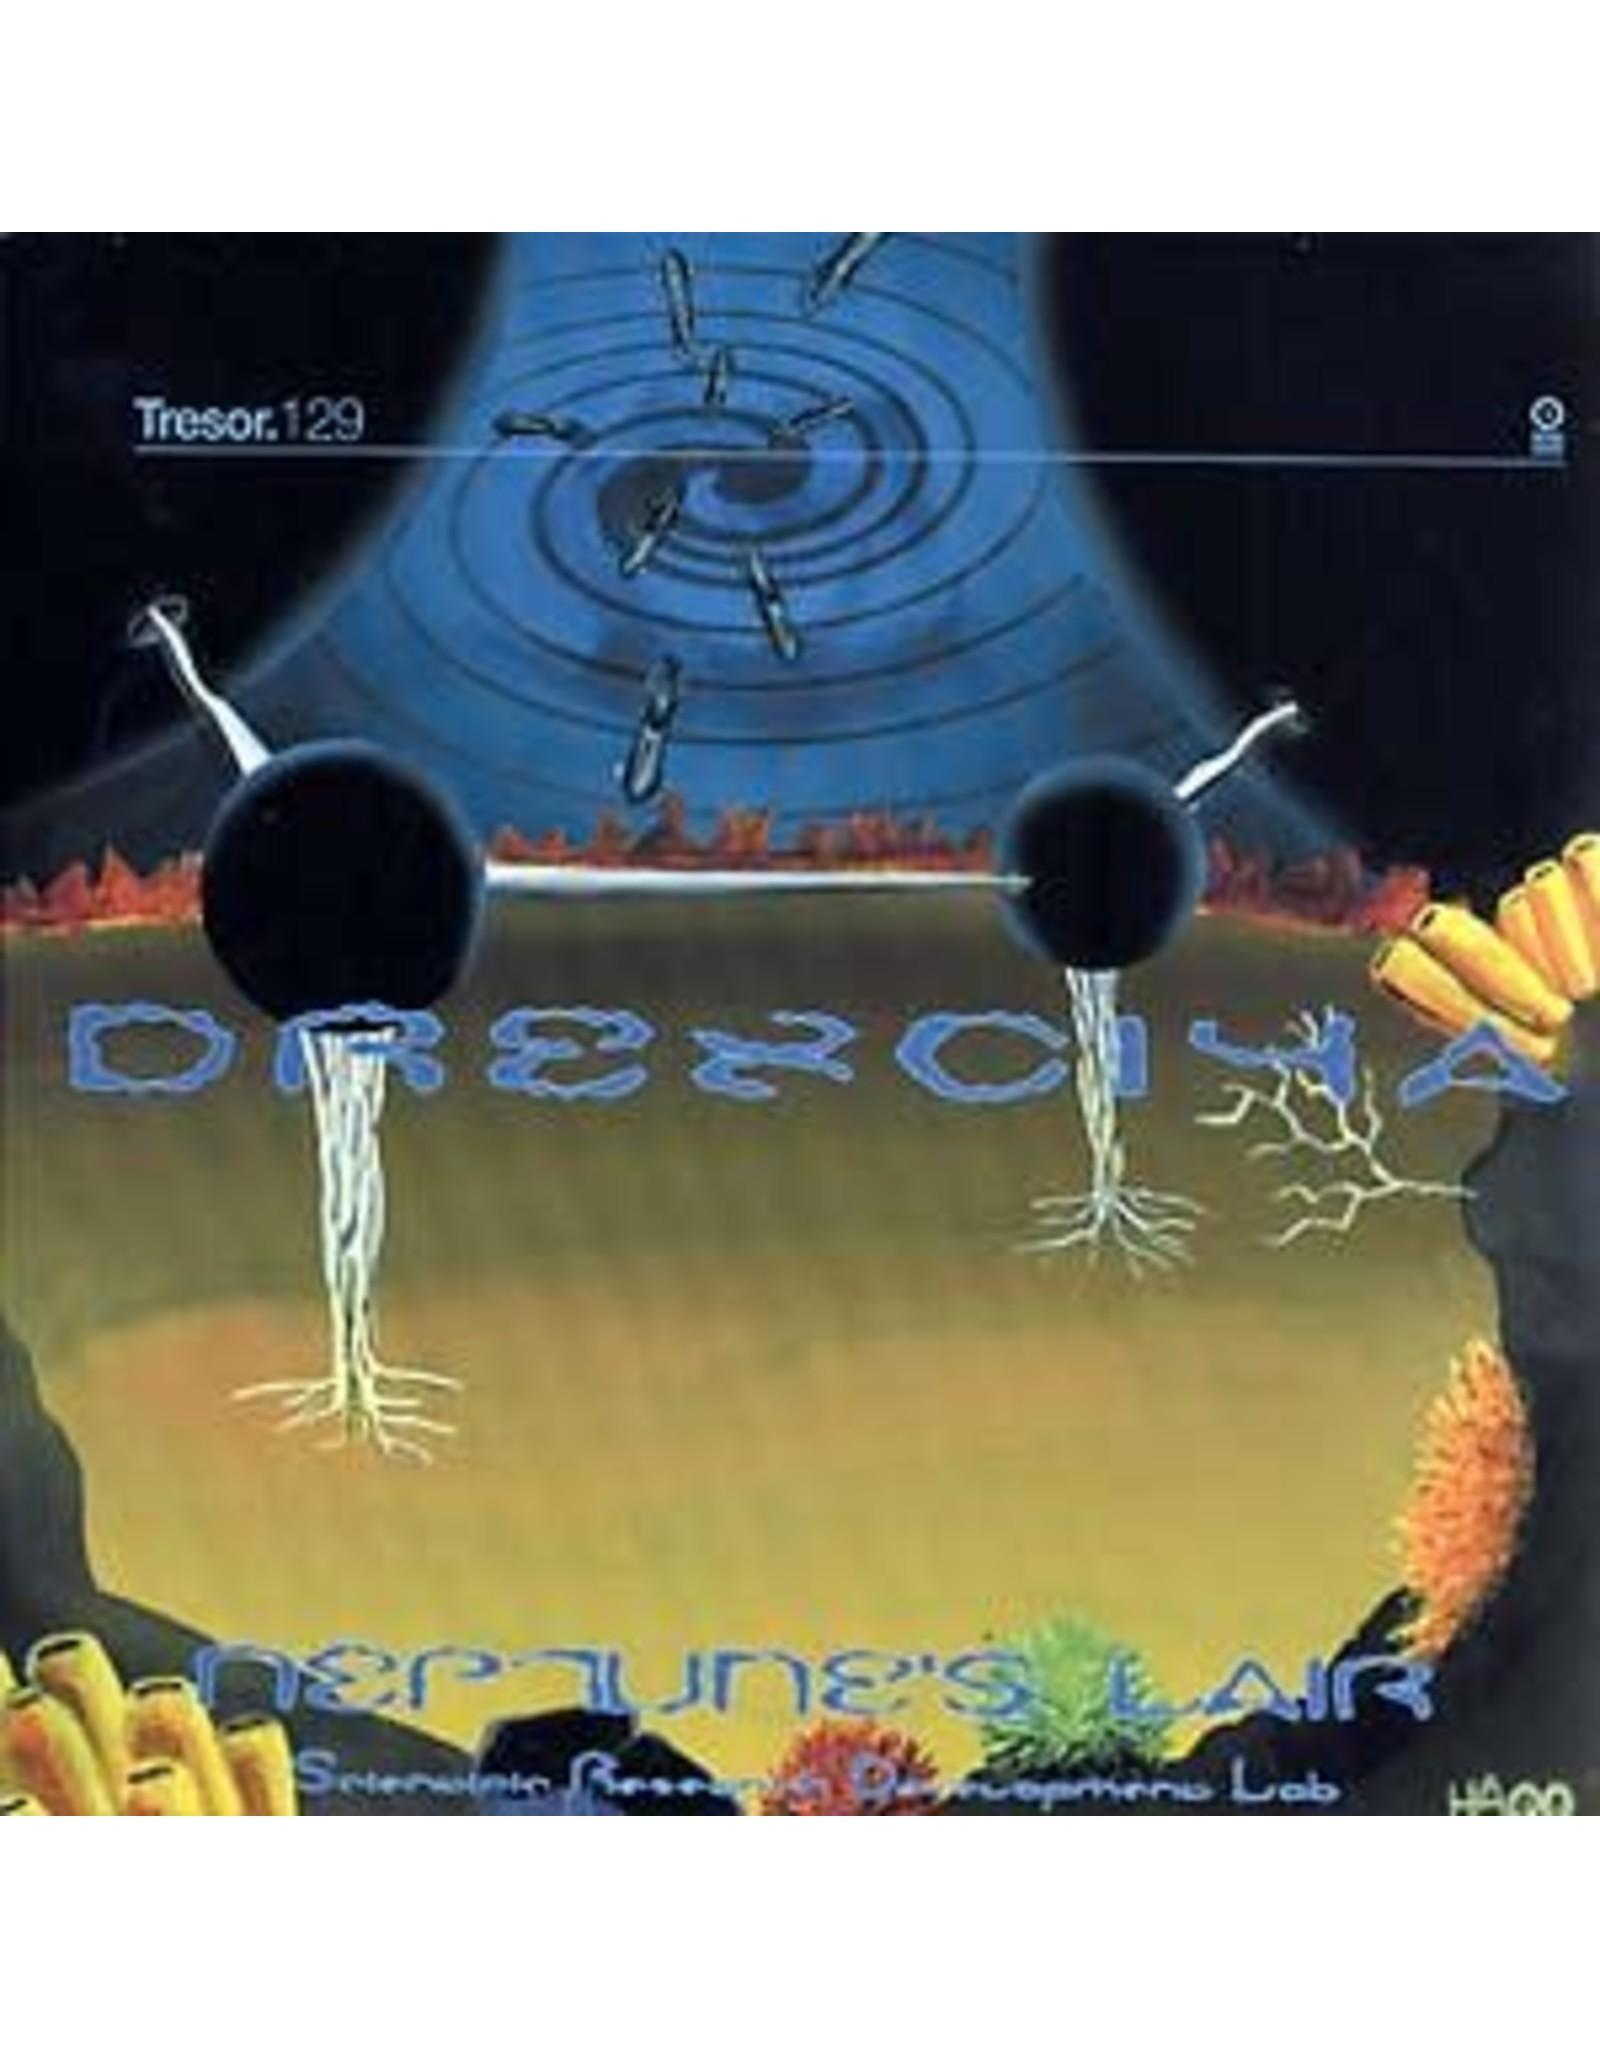 Tresor Drexciya: Neptune's Lair LP